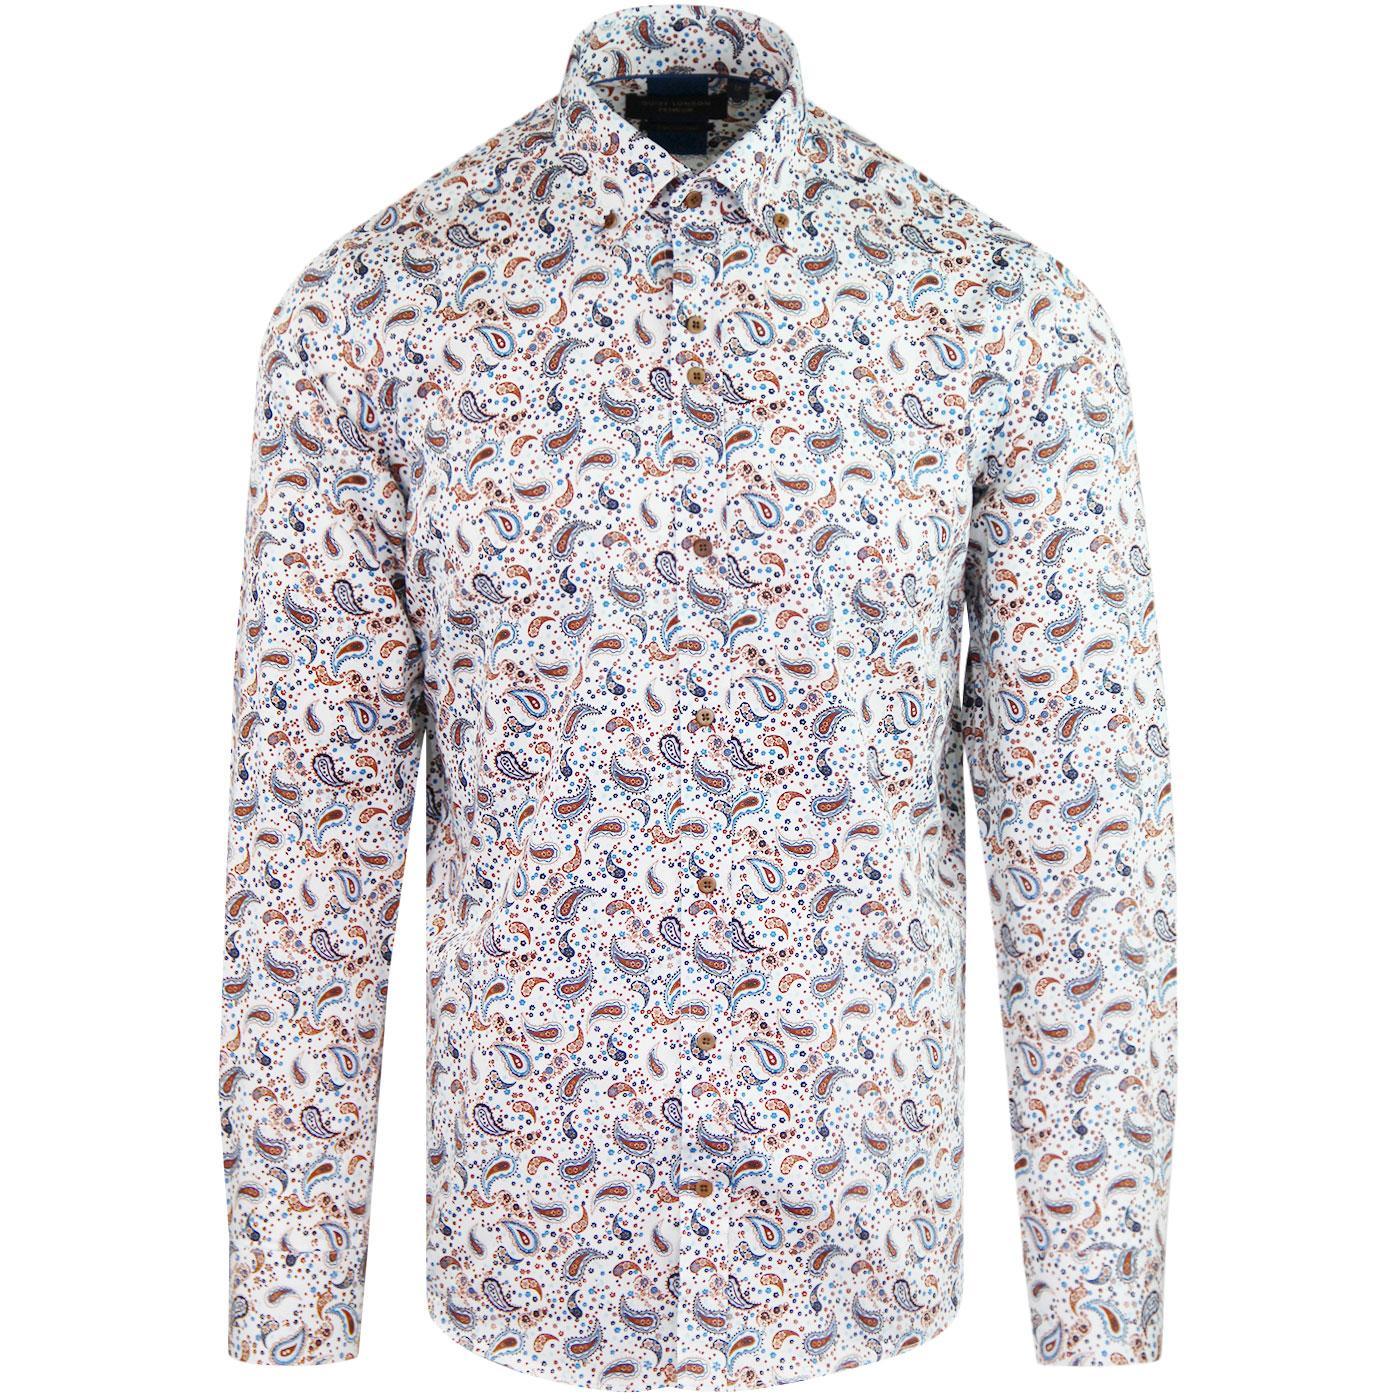 GUIDE LONDON 60s Mod Button Down Paisley Shirt (W)